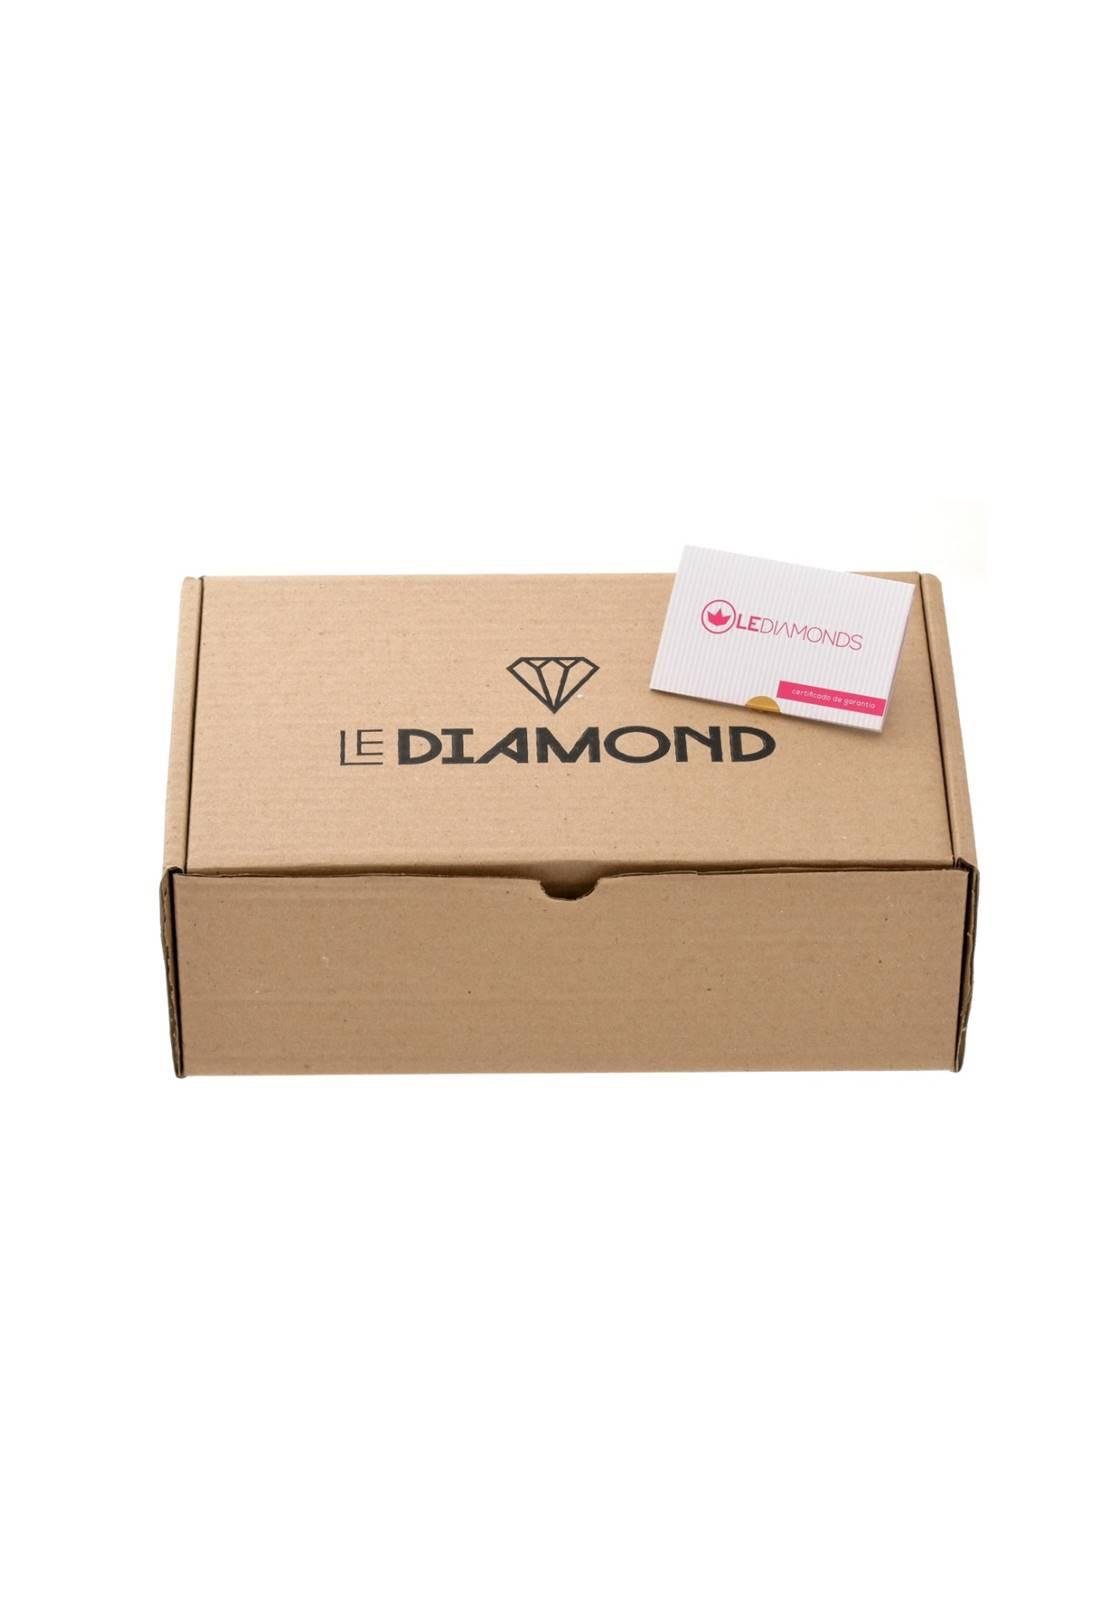 Brinco Le Diamond Forma Geométrica Animal Print Marrom